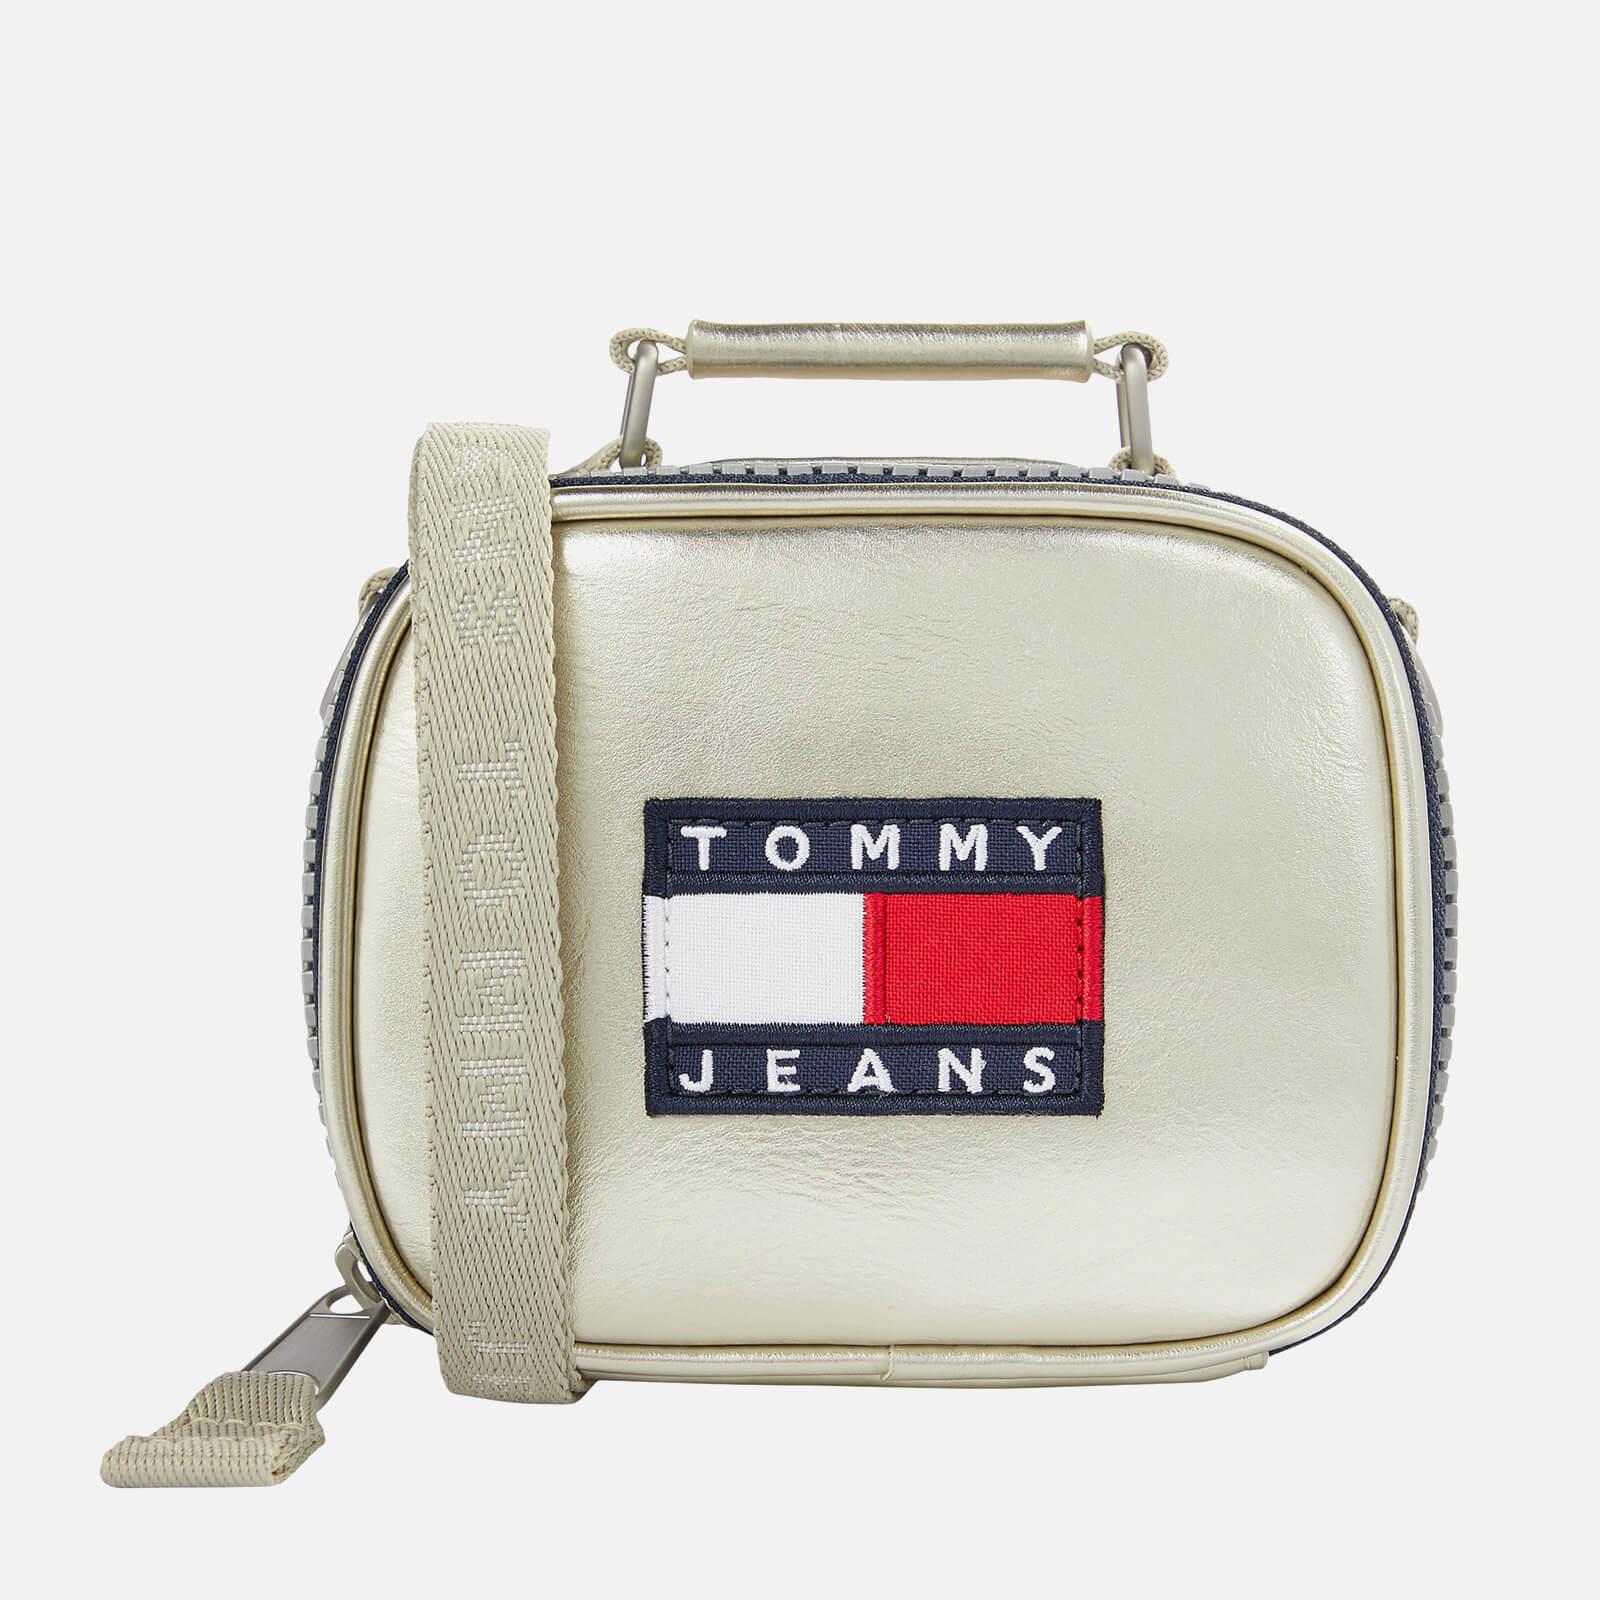 Tommy Jeans Women's Heritage Metallic Nano Bag - Silver